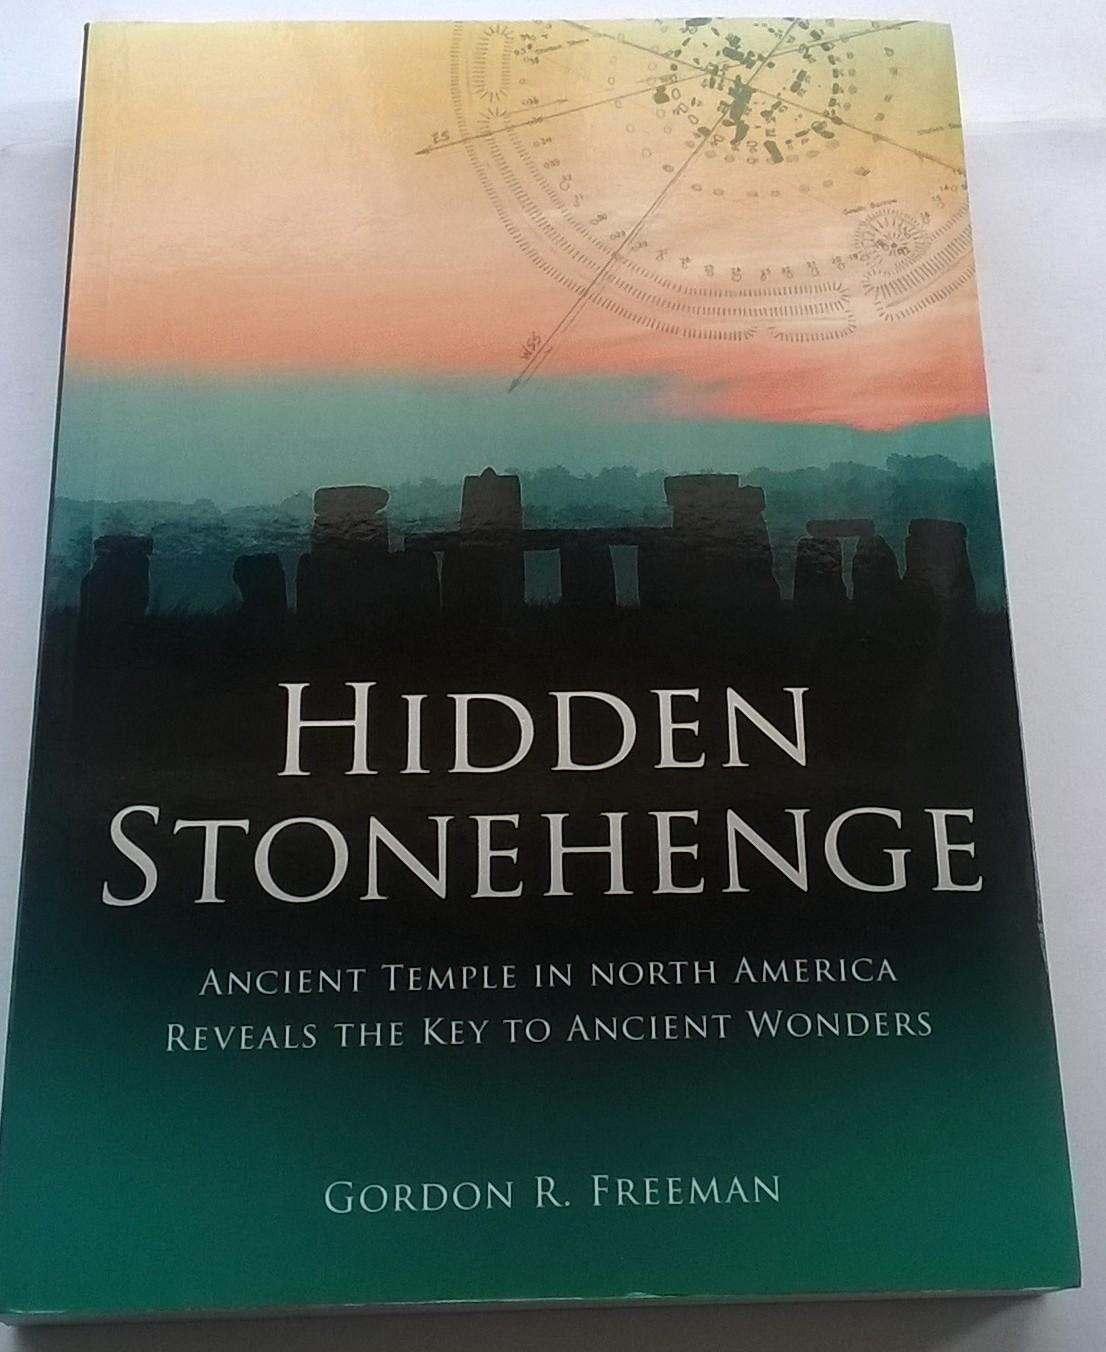 Hidden Stonehenge :Ancient Temple in North America Reveals the Key To Ancient Wonders, Freeman, Gordon R ;